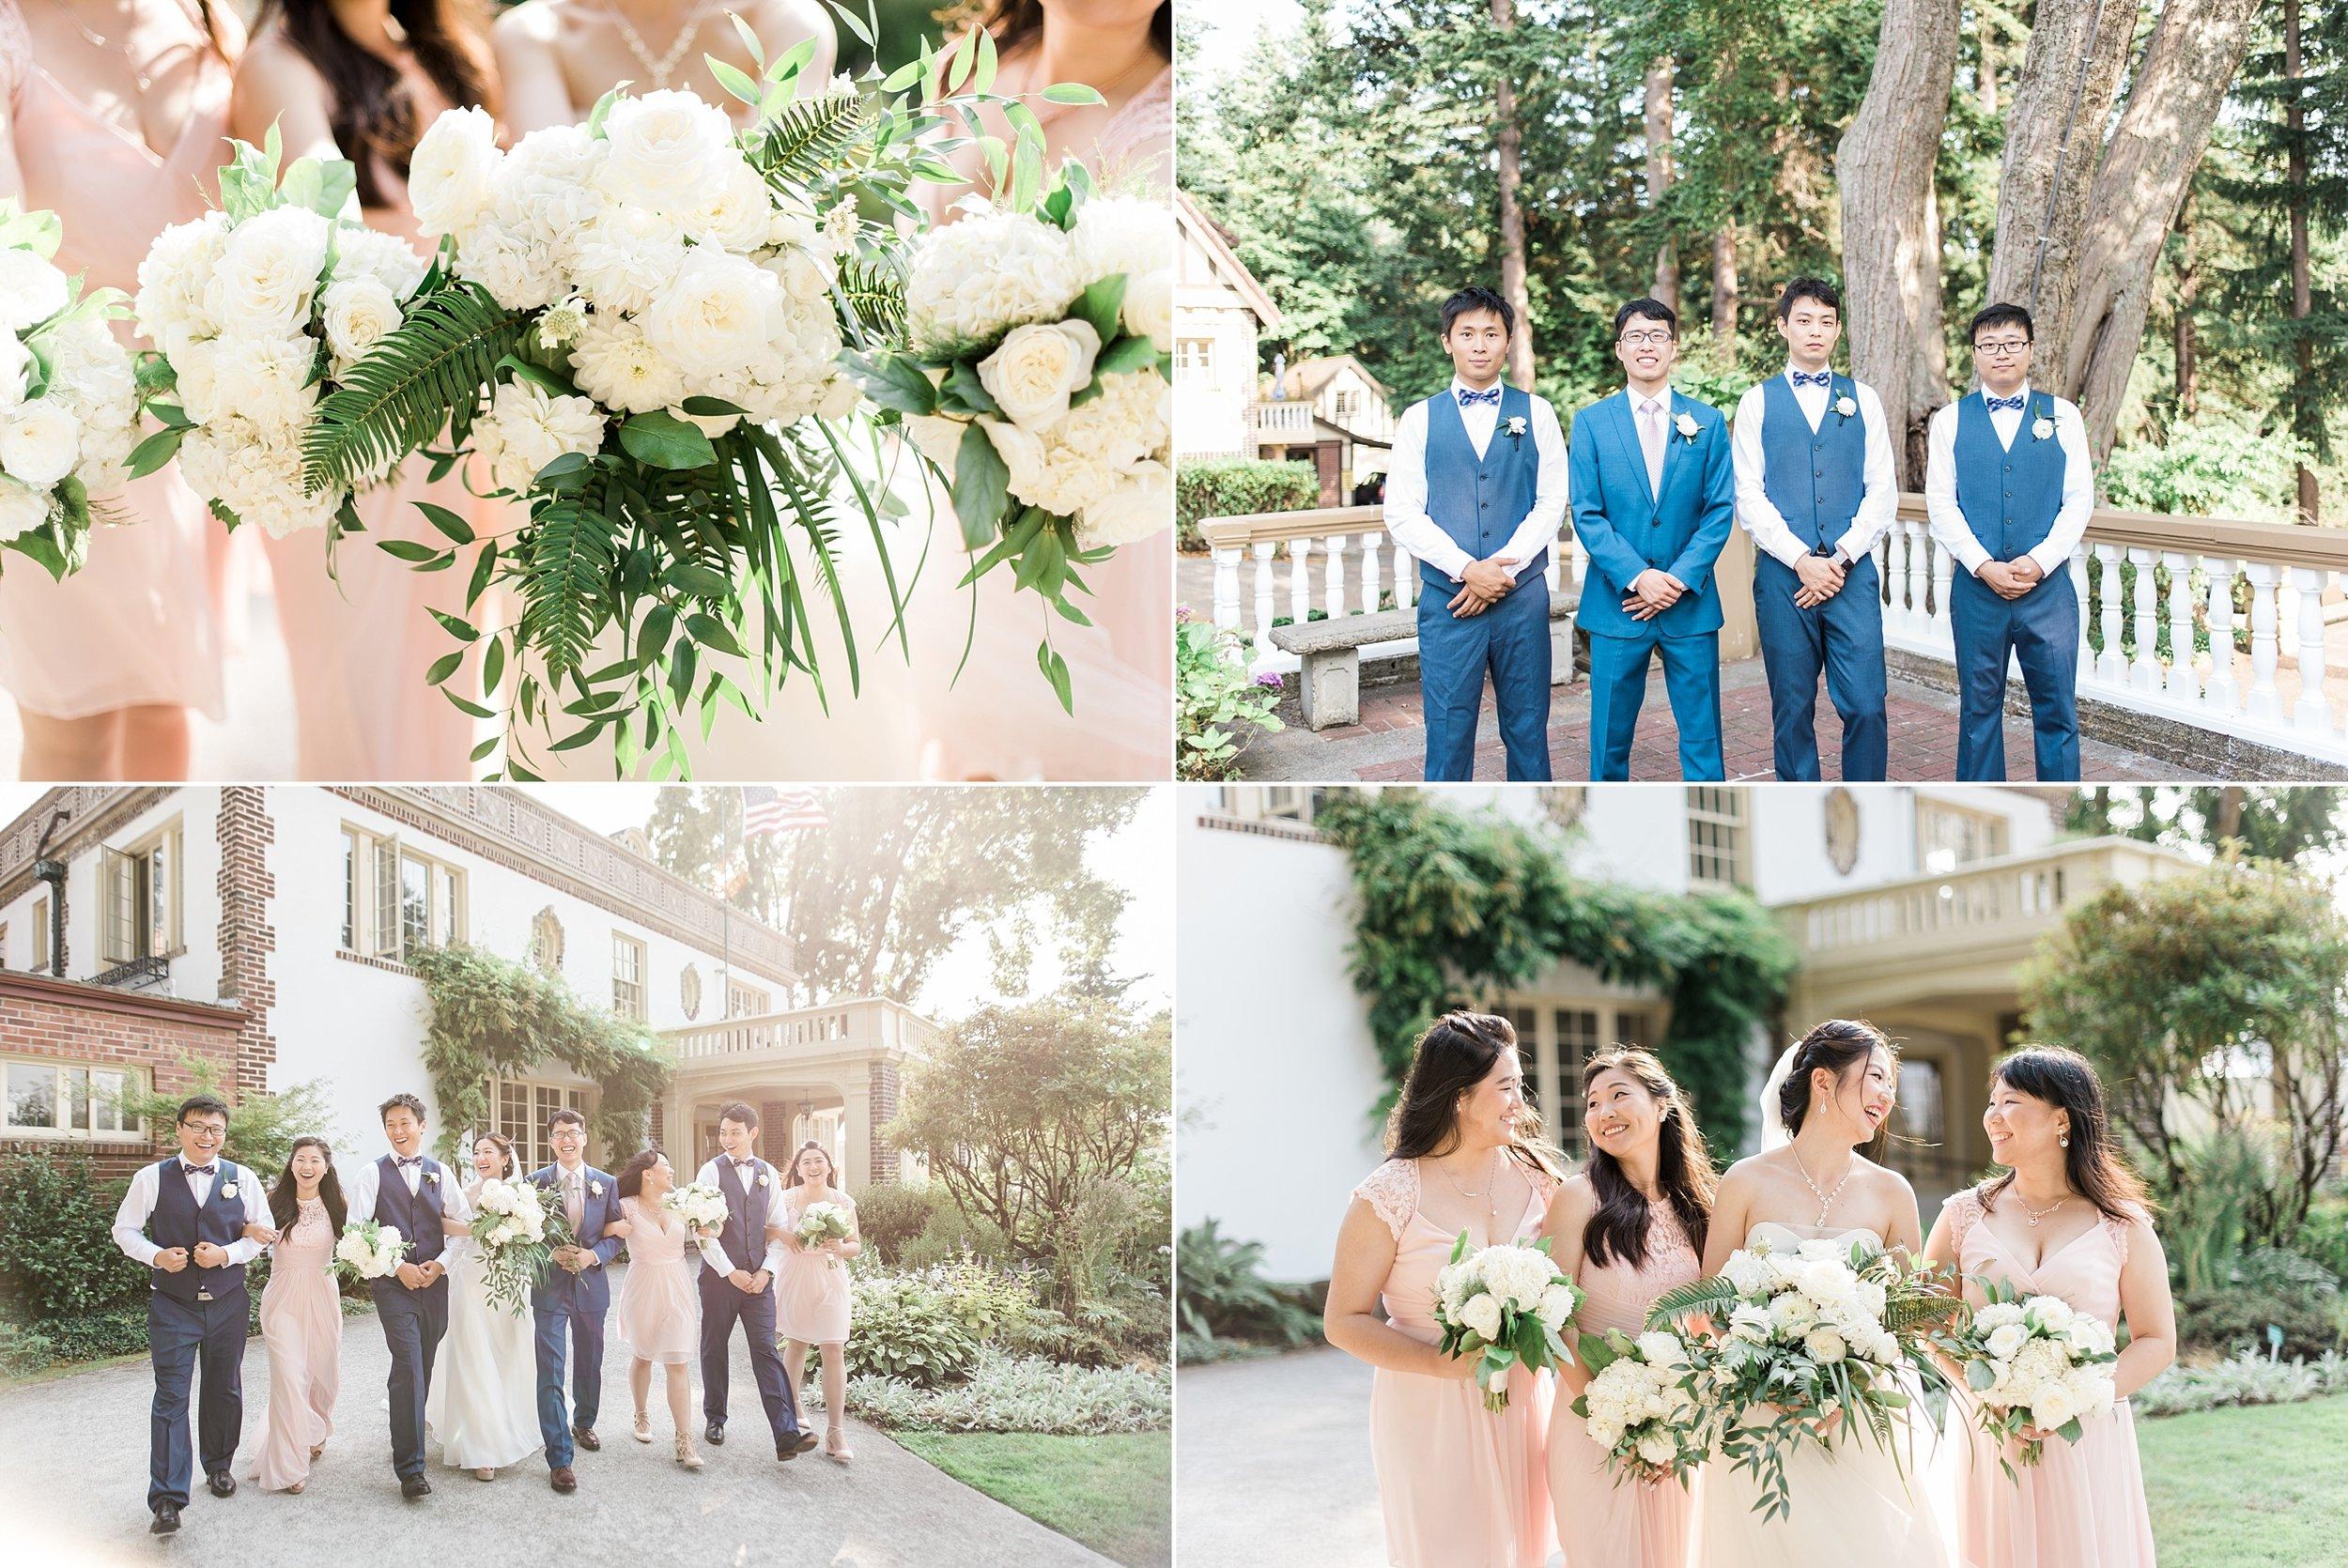 Lairmont Manor WEdding, Seattle Wedding Photography, Snohomish W